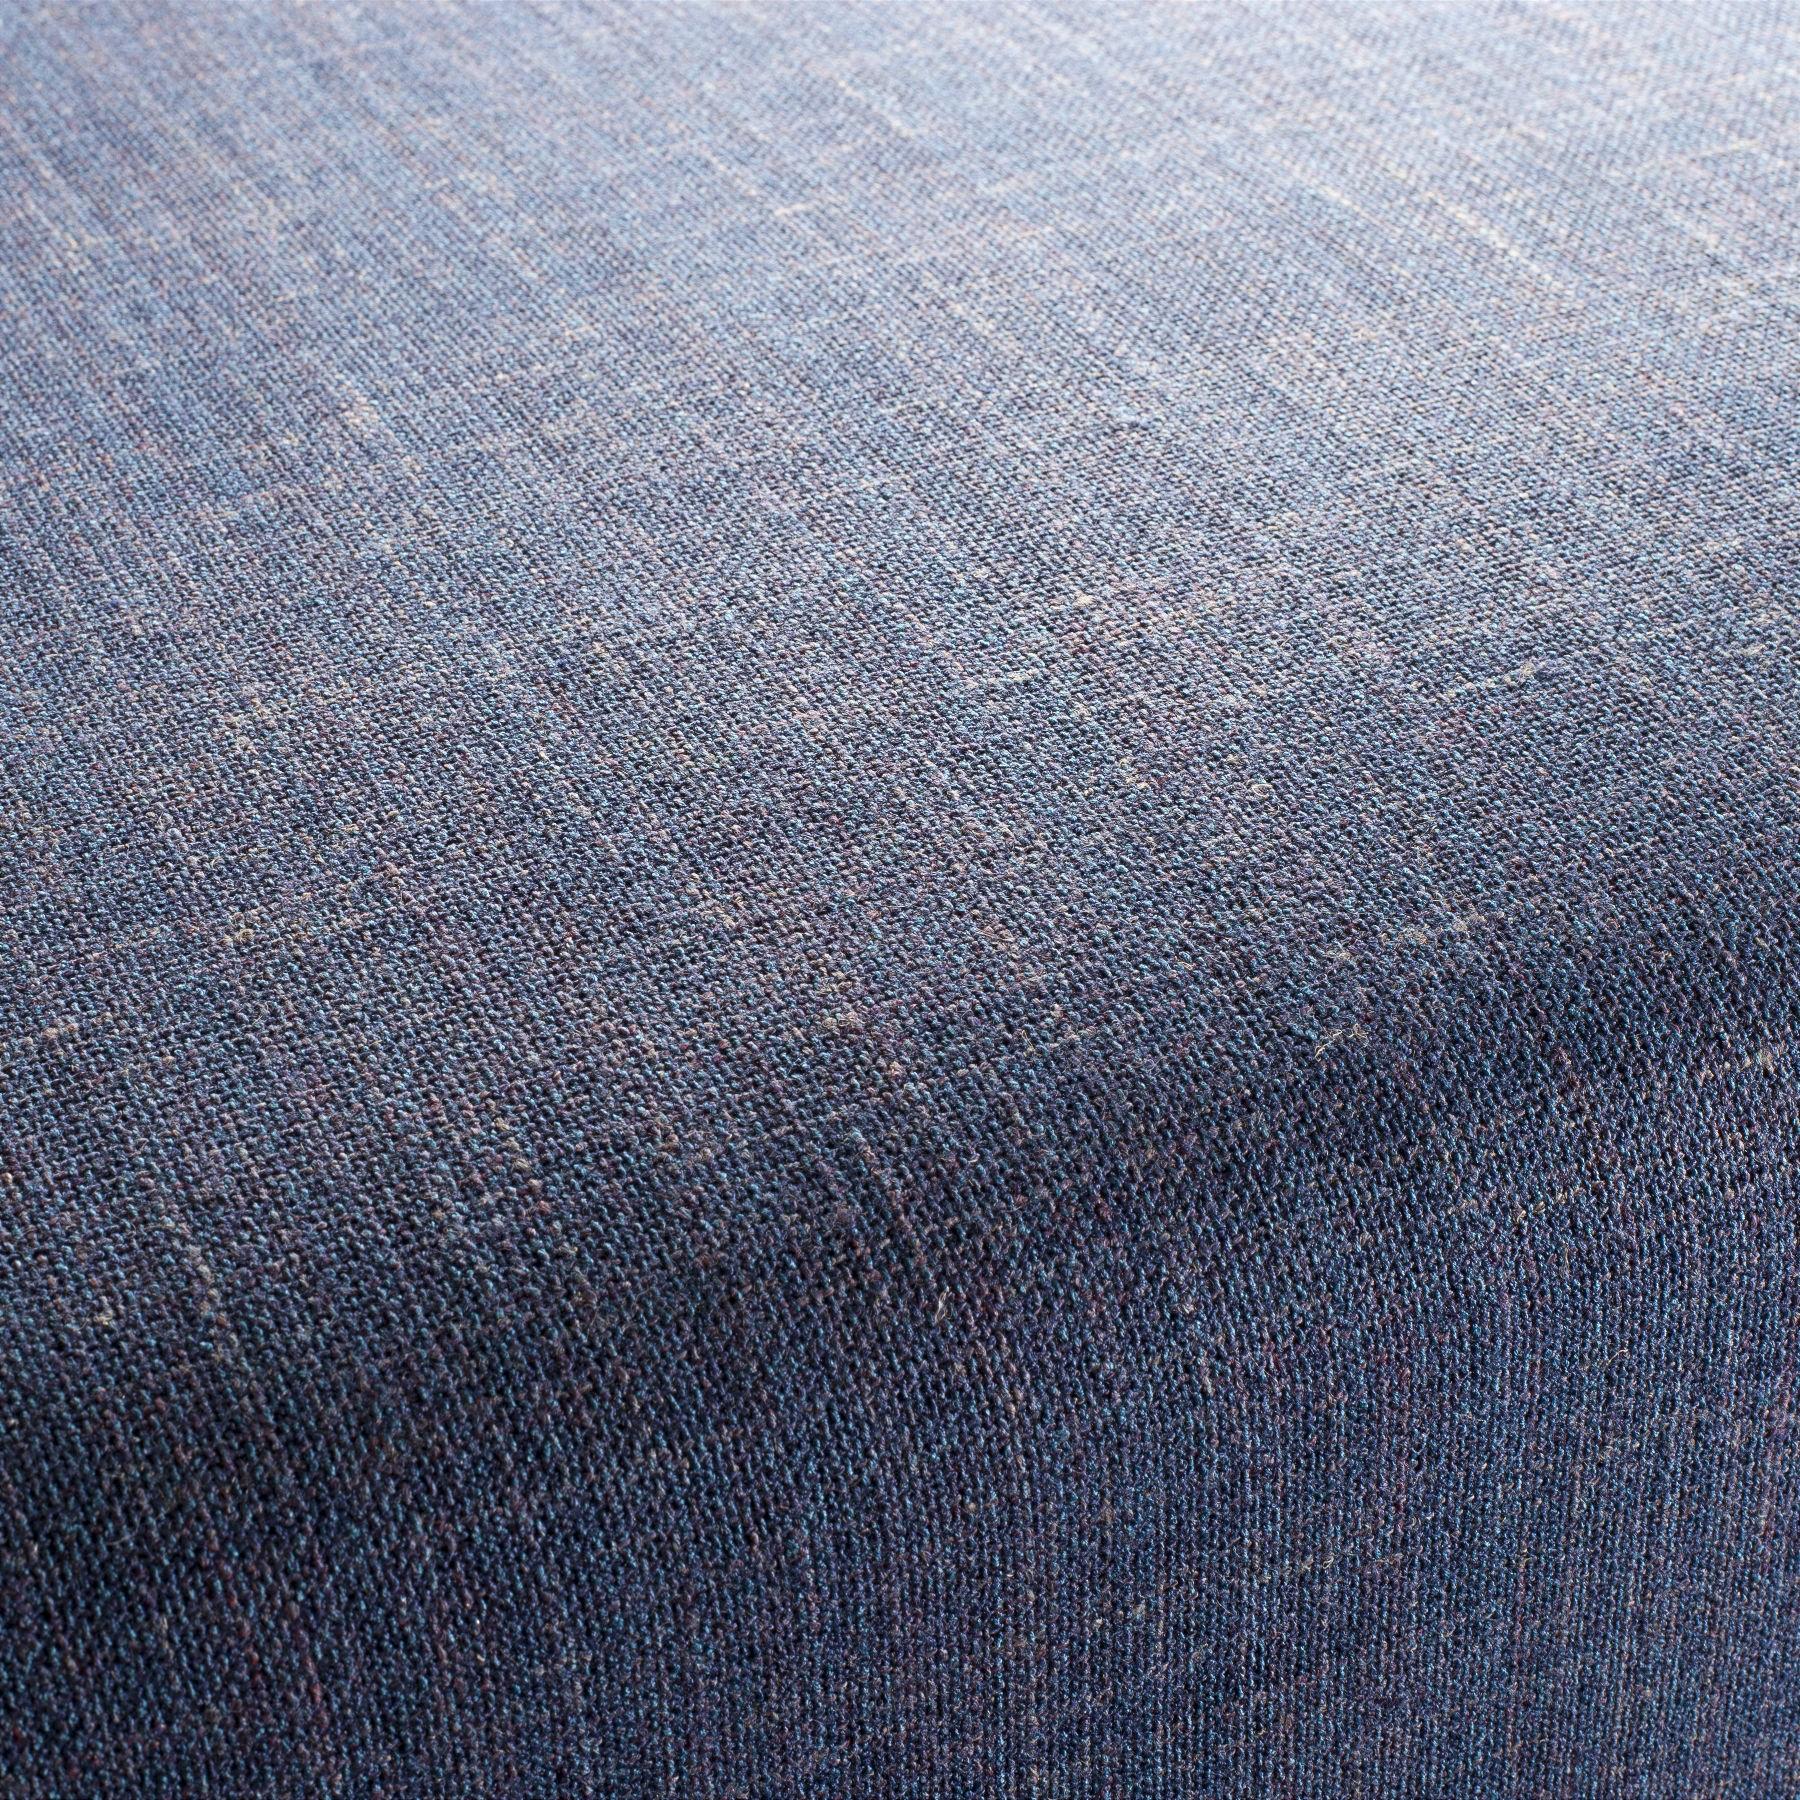 upholstery fabric stan 9 2234 051 jab anstoetz fabrics. Black Bedroom Furniture Sets. Home Design Ideas